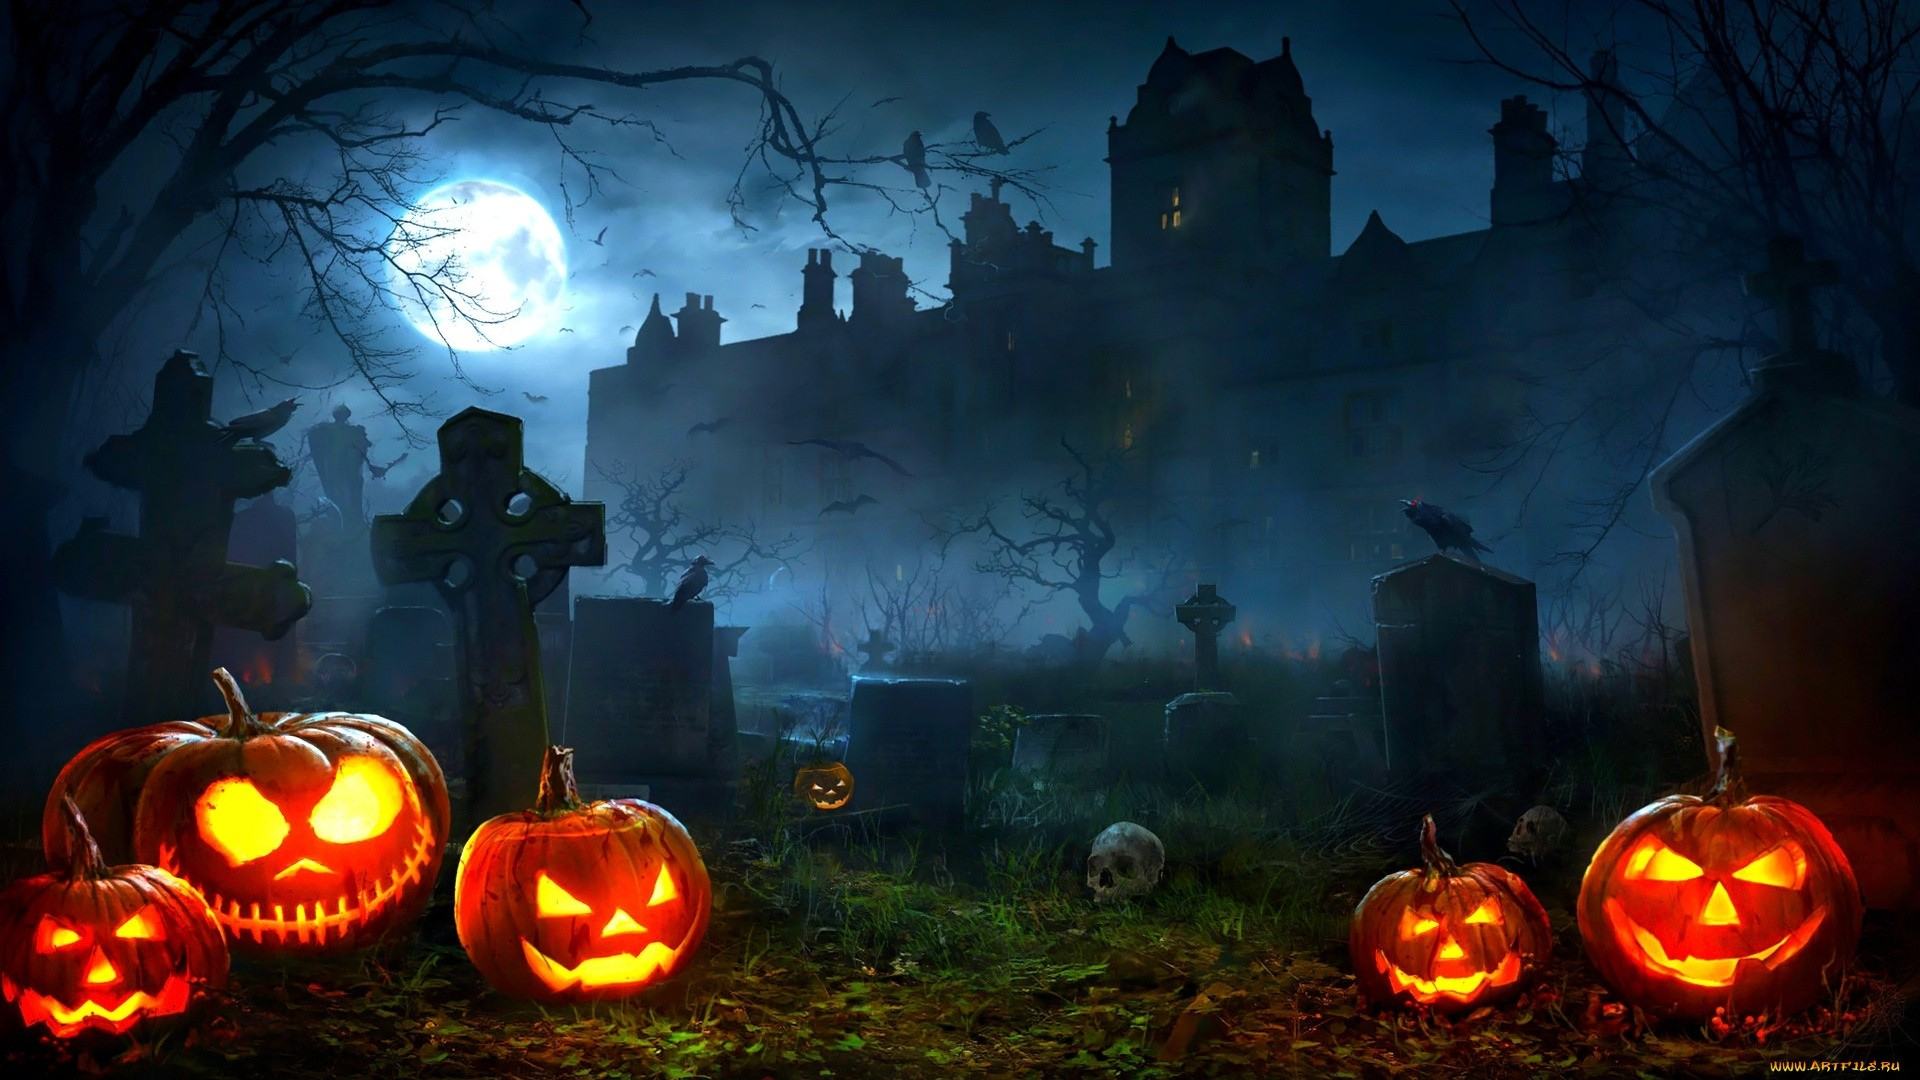 Spooky Image